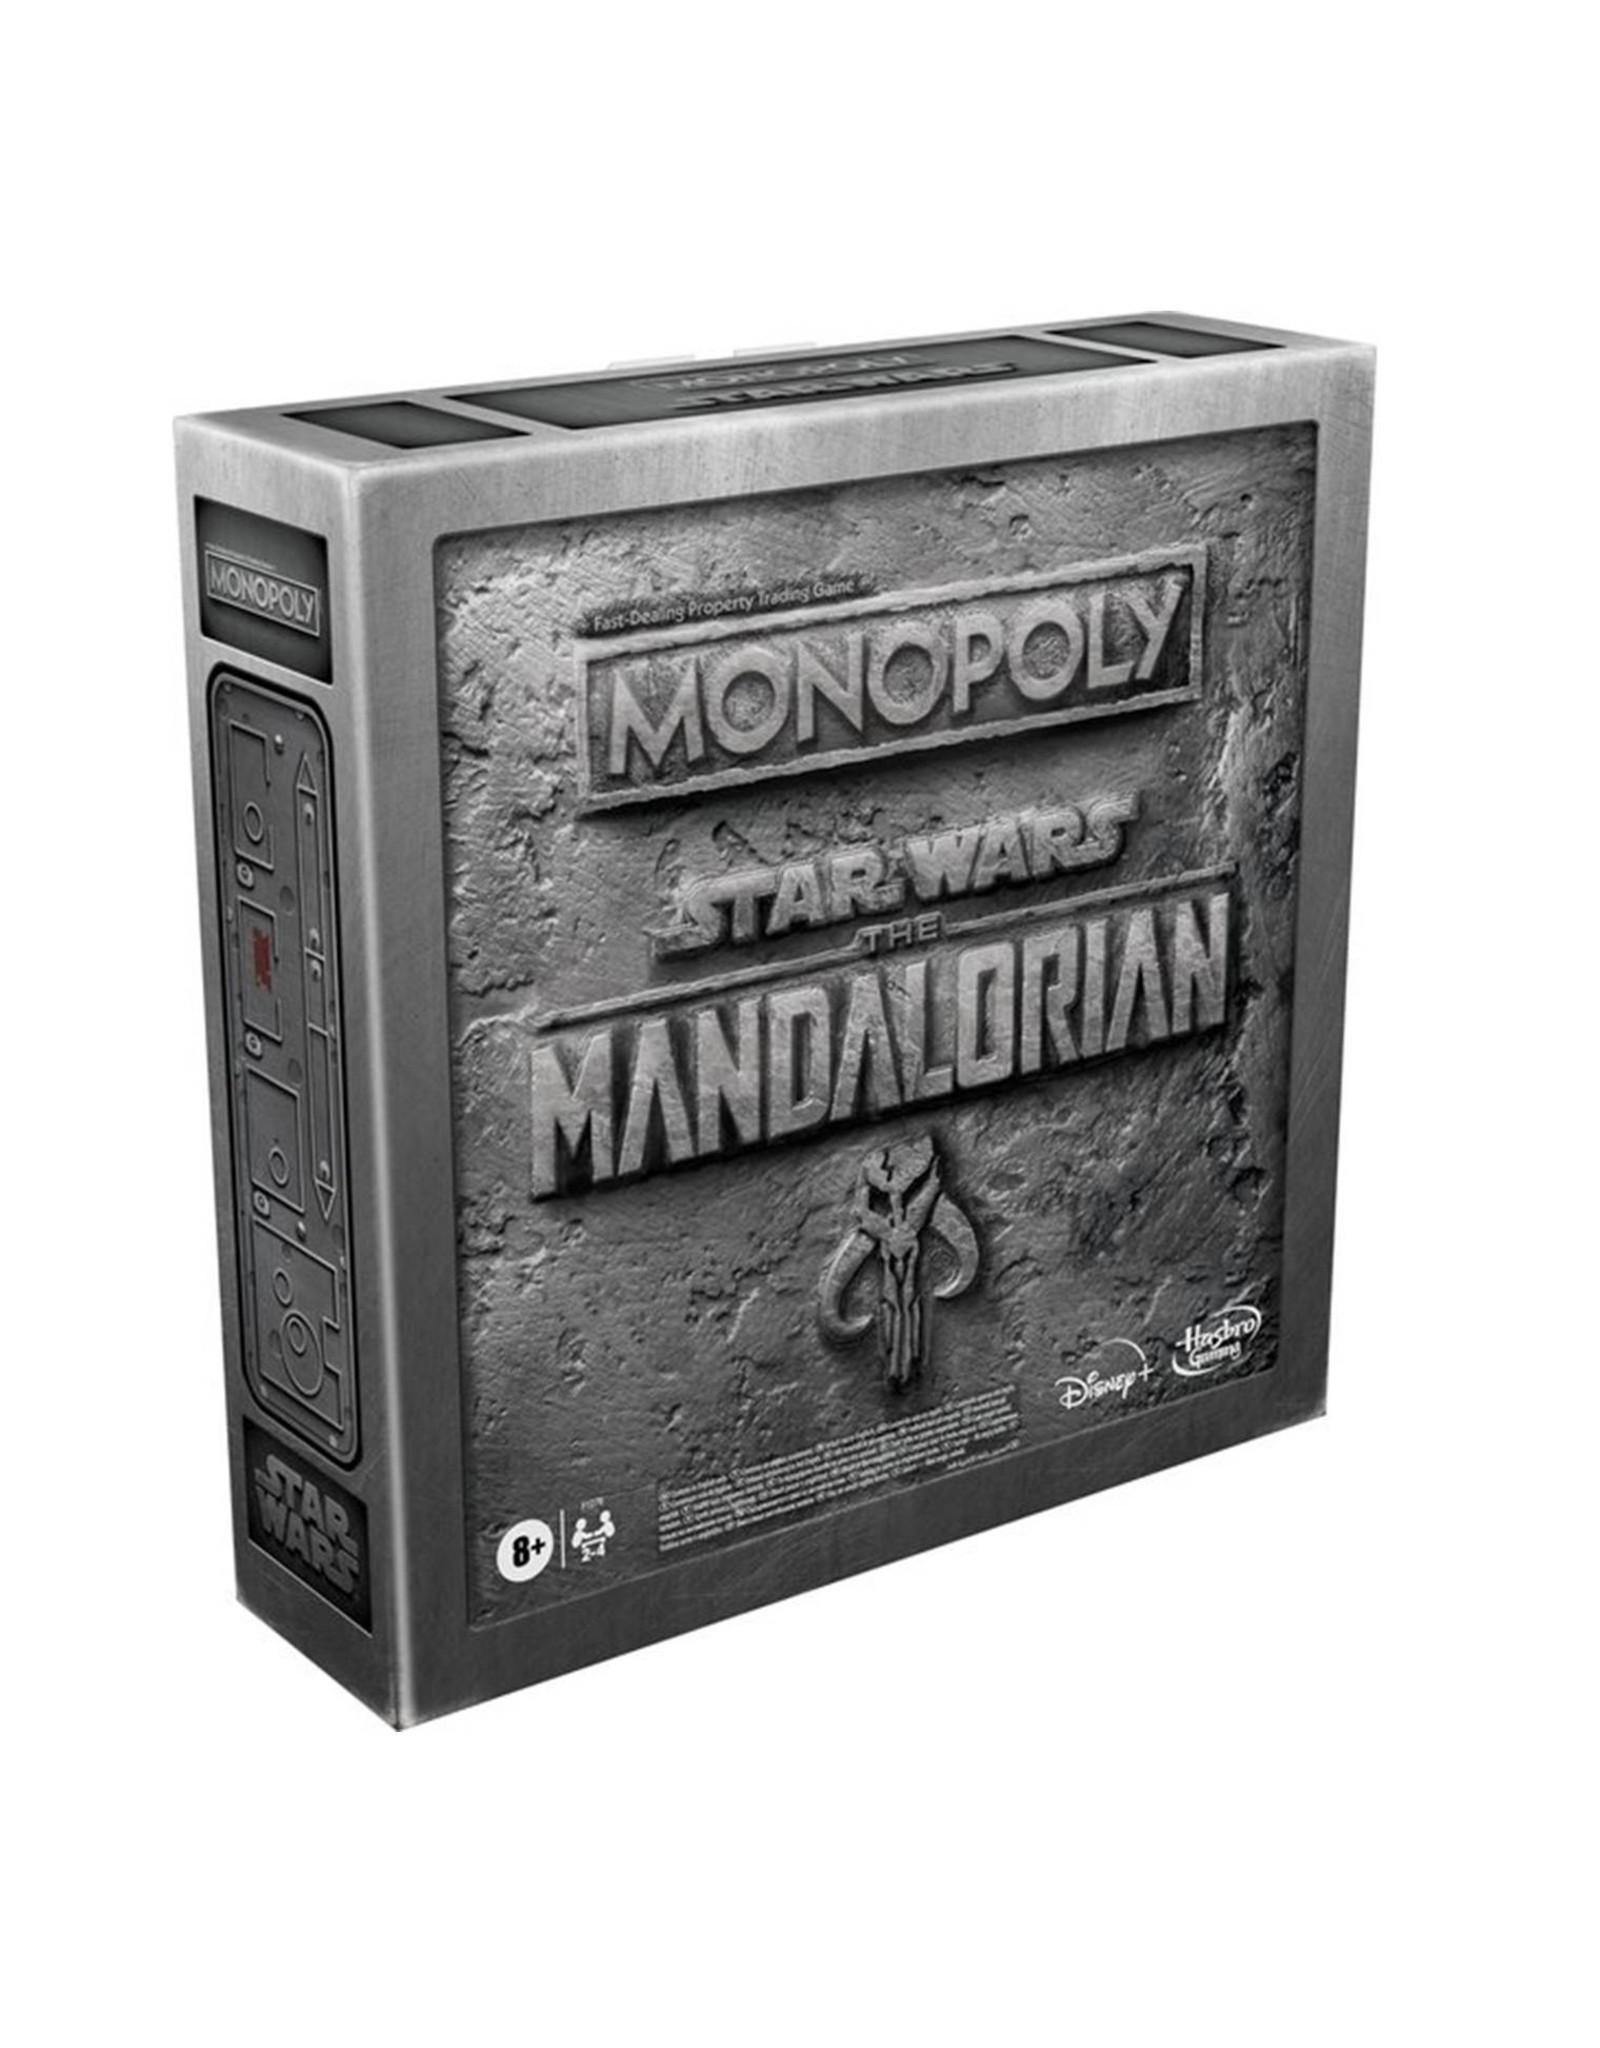 "Monopoly Monopoly - Star Wars ""The Mandalorian"" - Engelstalige versie"